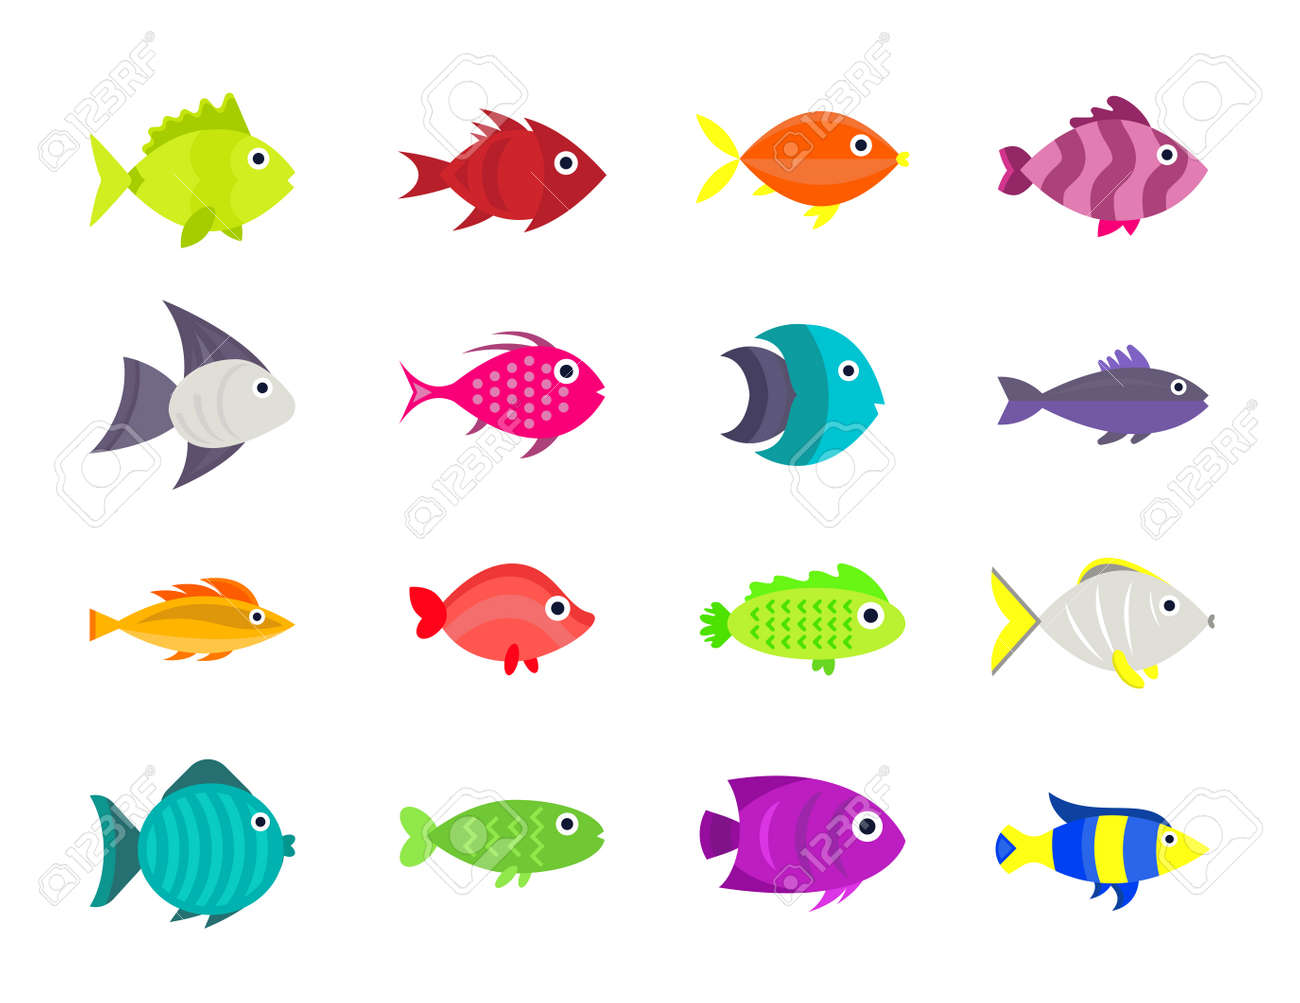 Cute fish vector illustration icons set. - 50475293